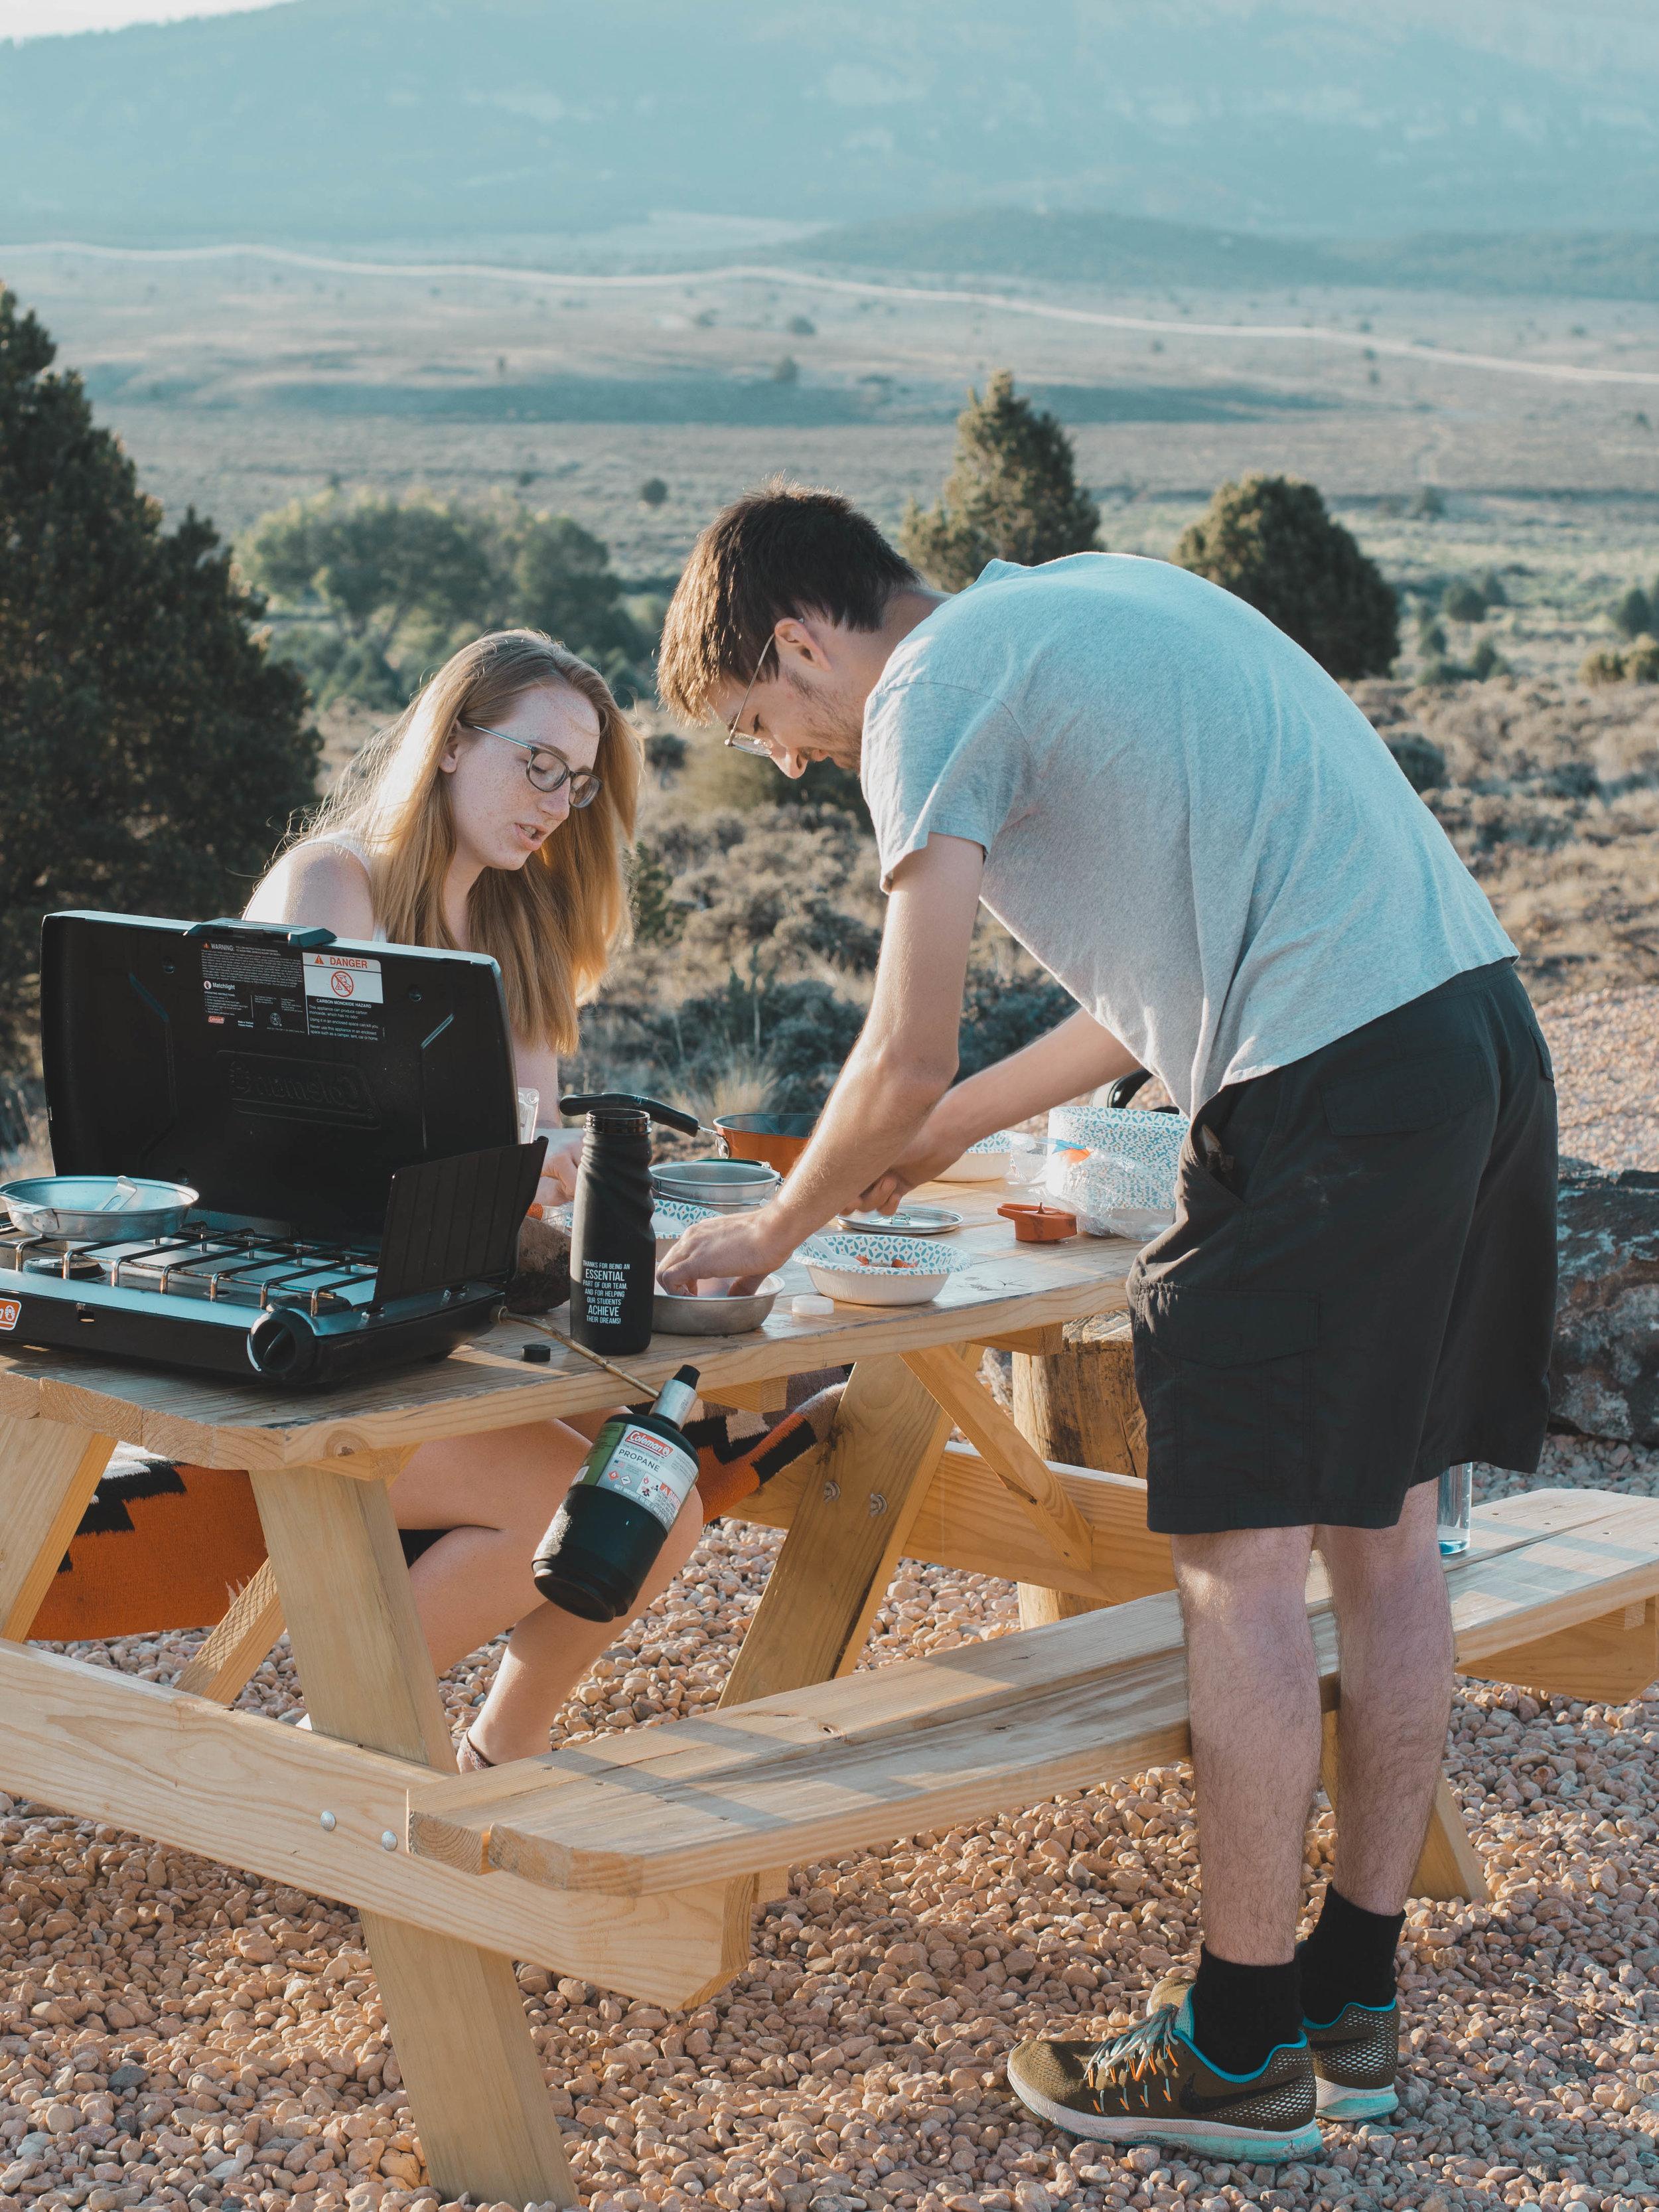 Preparing breakfast outside our tipi in Utah